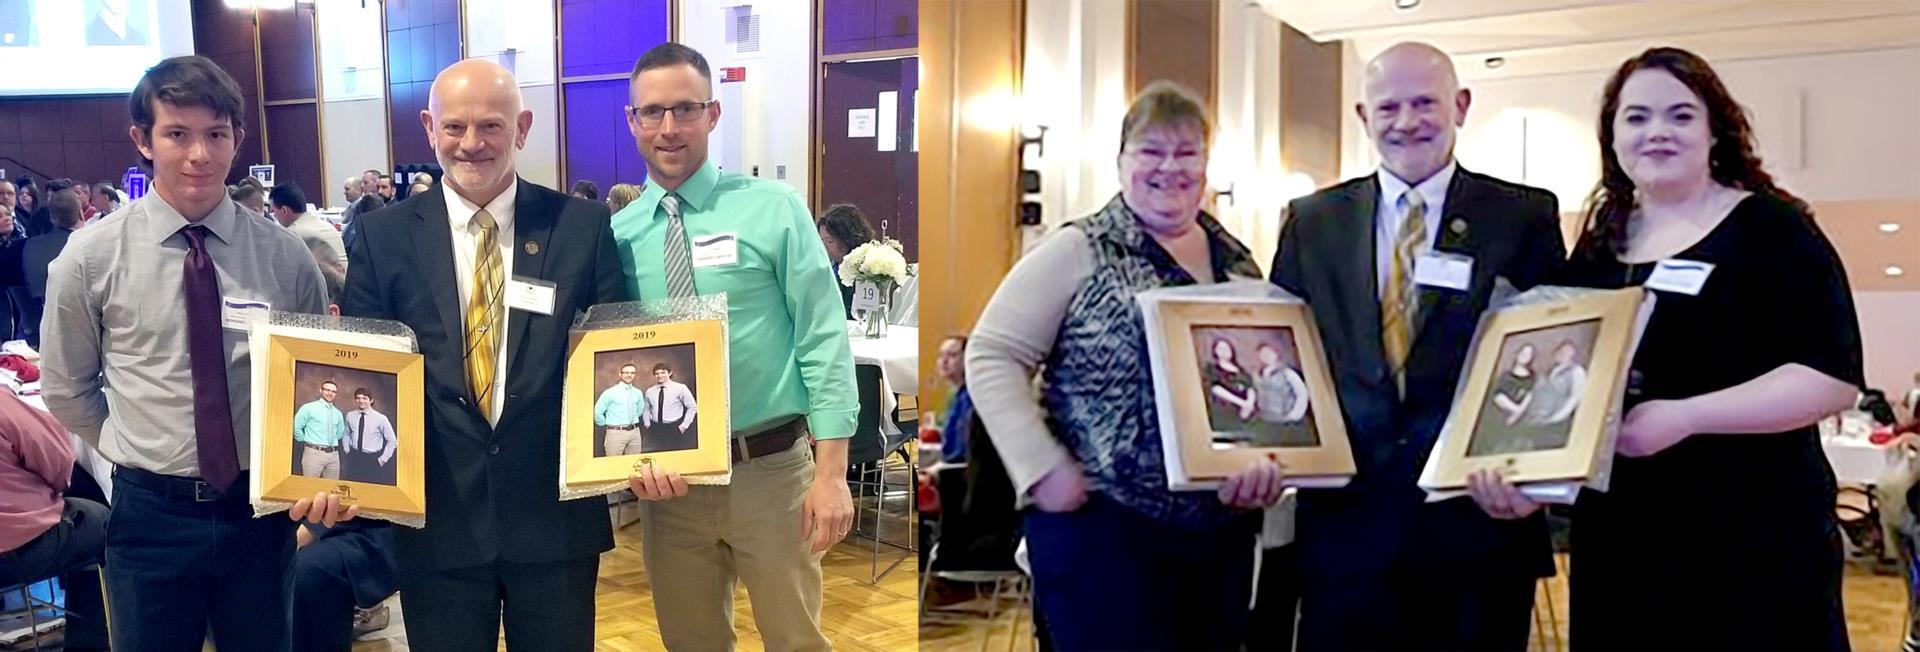 S-E 2019 Scholar Recognition Award Winners